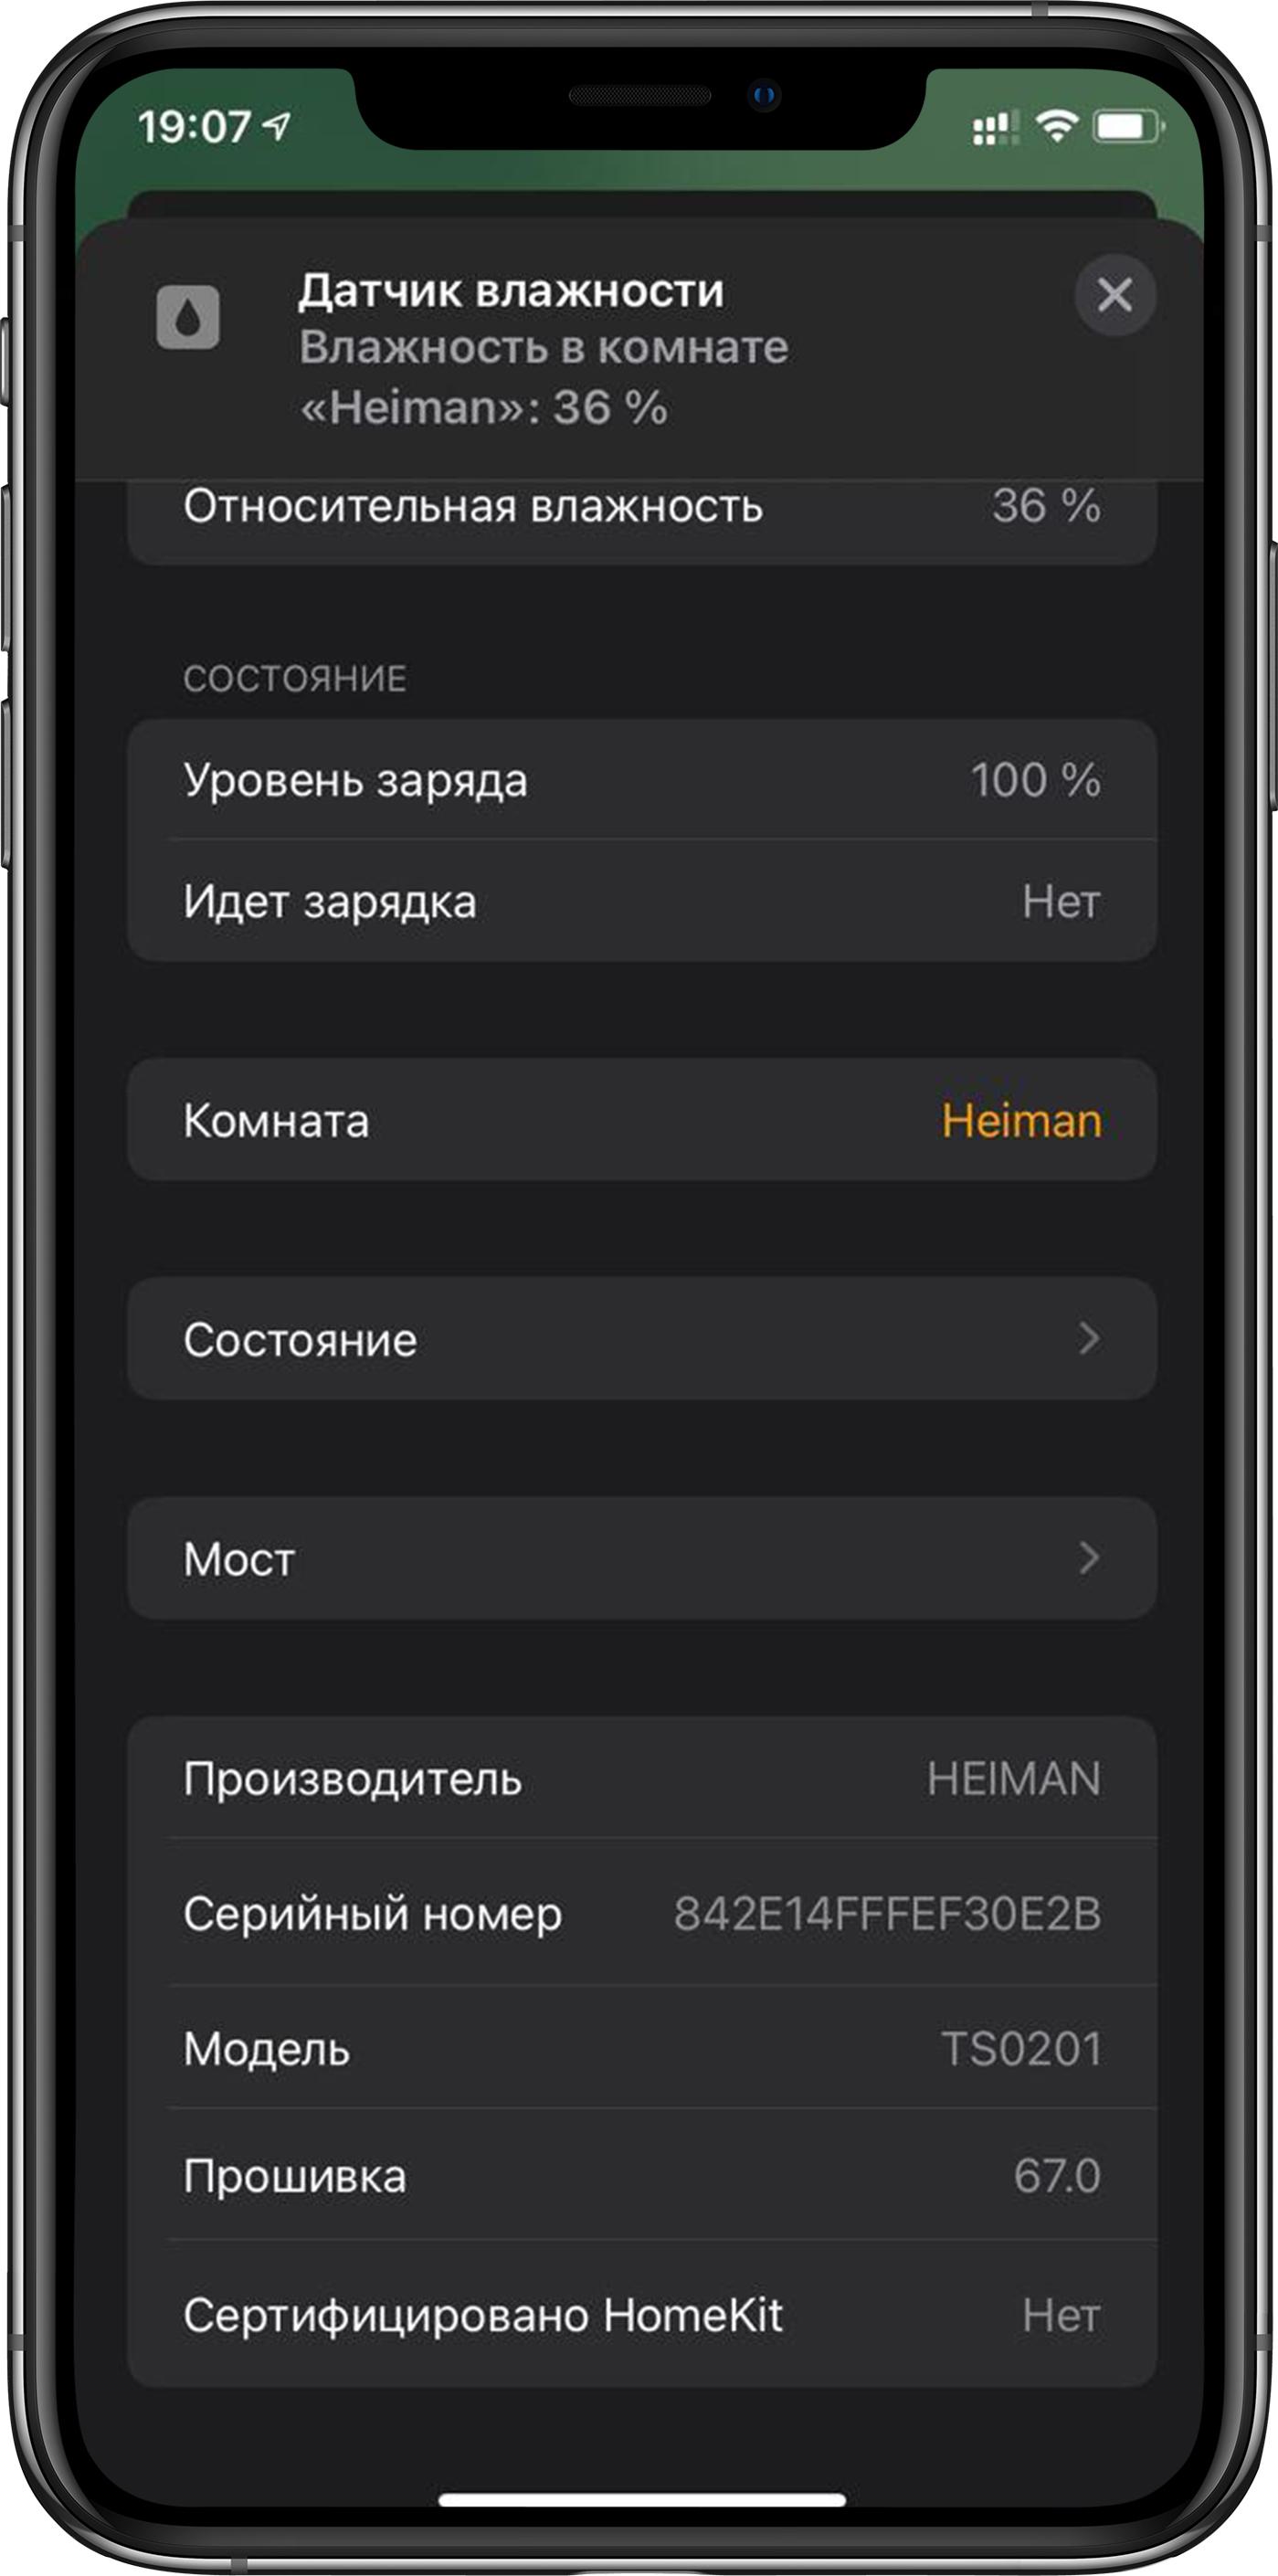 1600x_image.png?1600683733